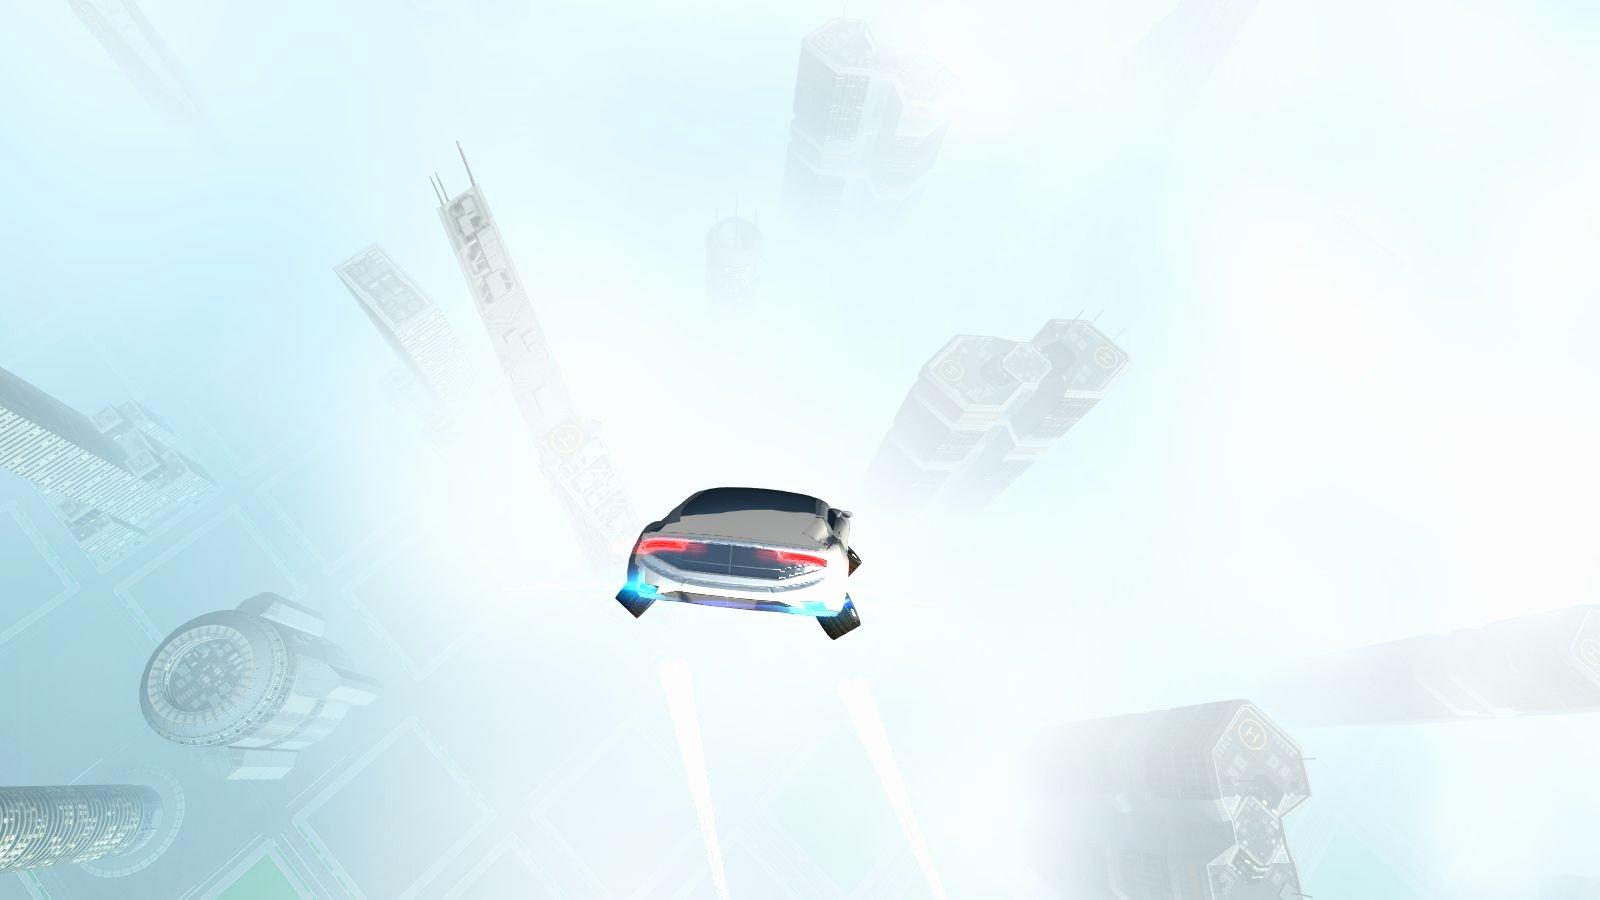 Future How It Feel Download Fresh Futuristic Flying Car Driving Apk V3